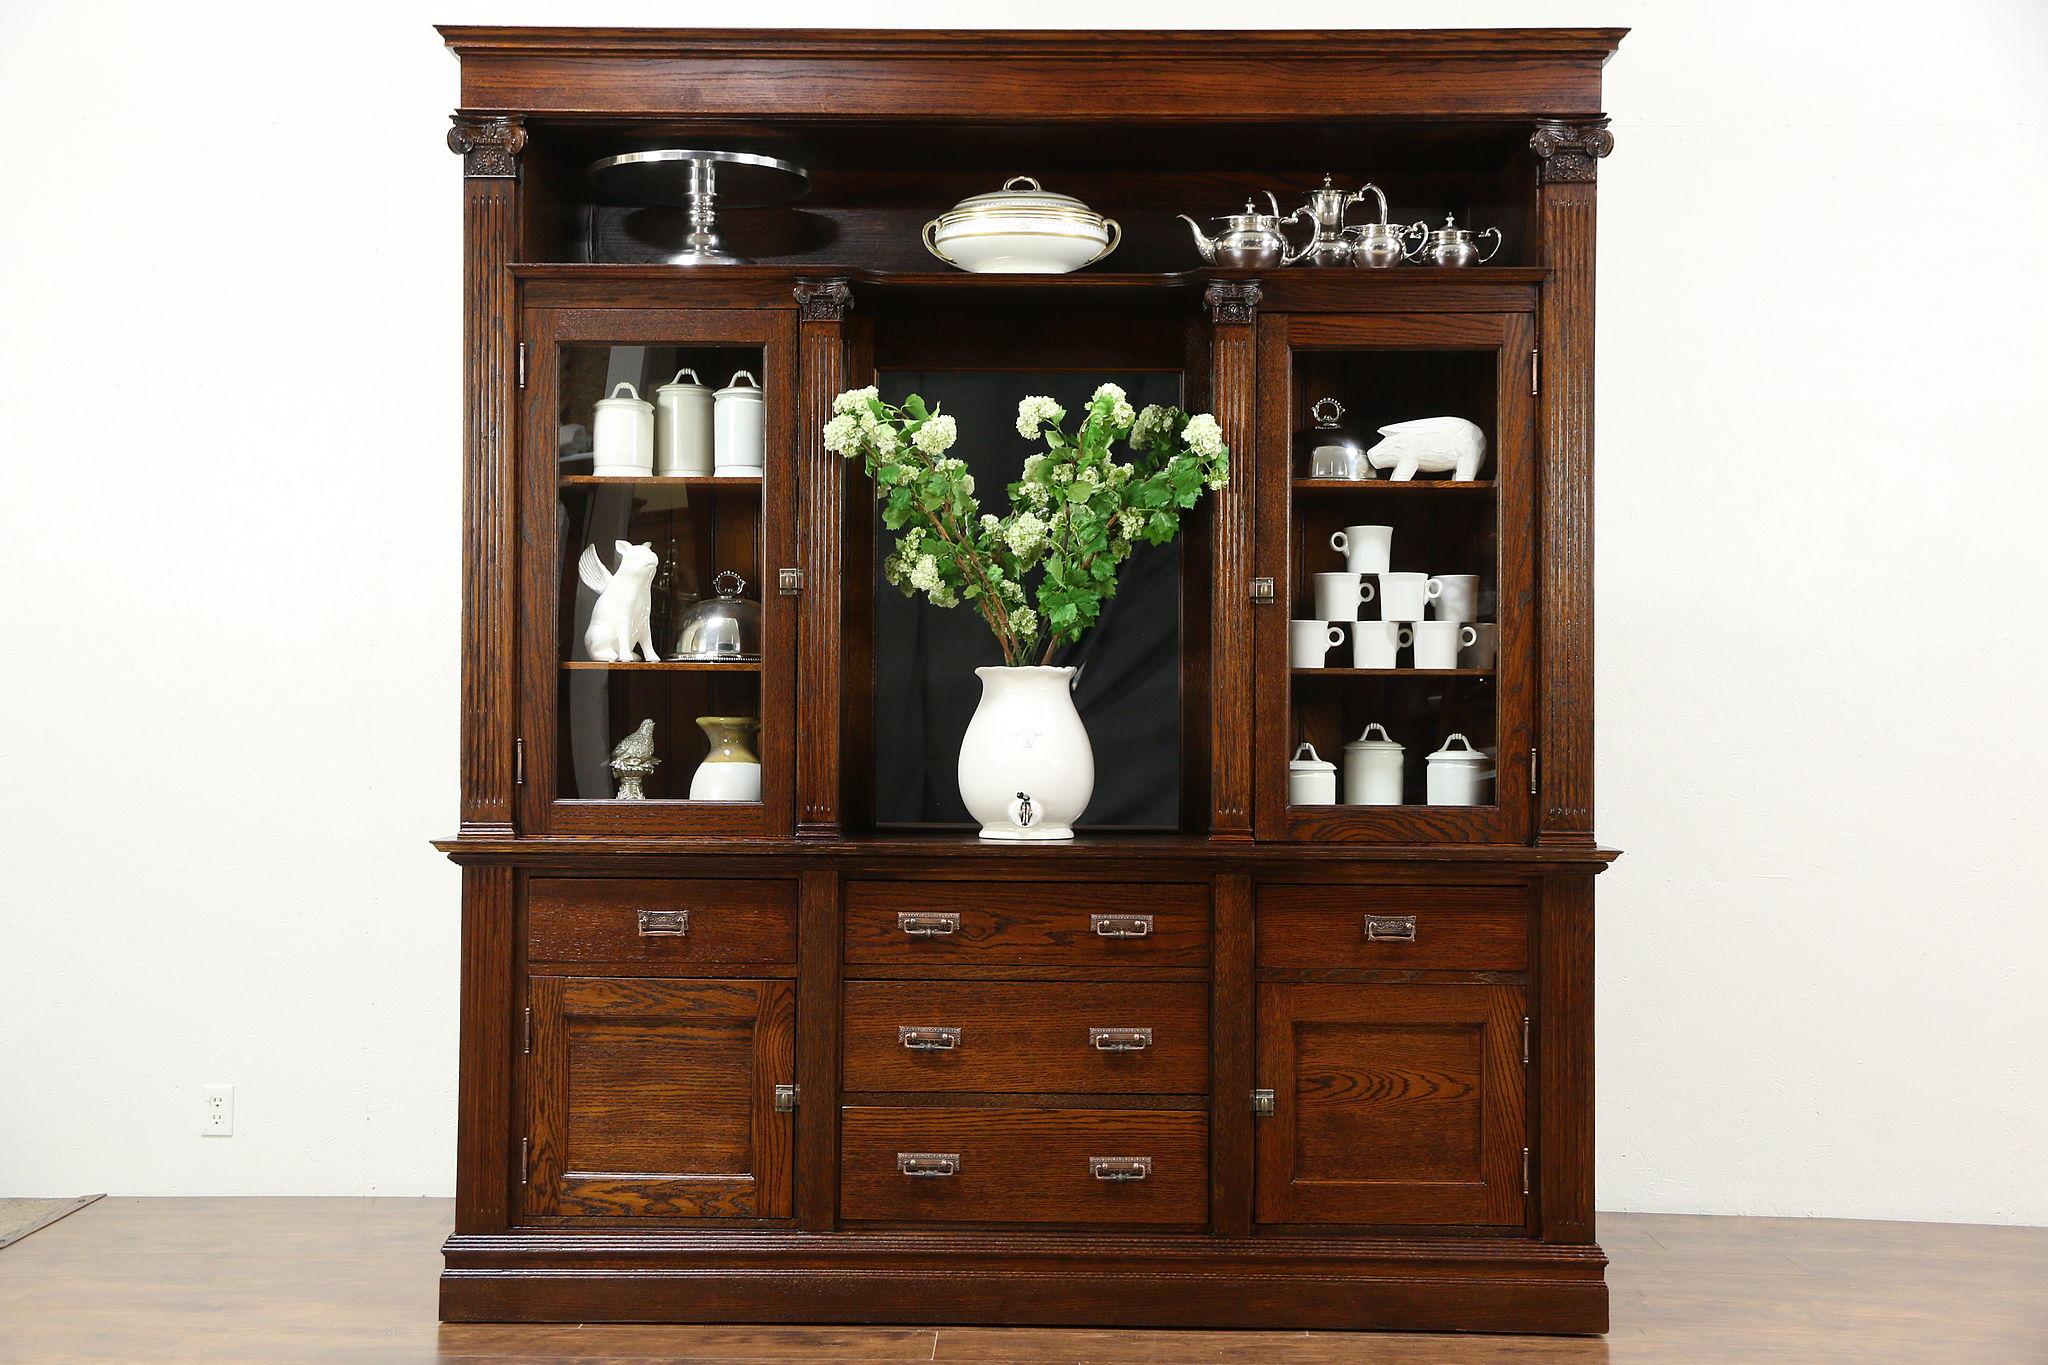 SOLD - Oak 1900 Antique Back Bar or China Cabinet & Sideboard with ...